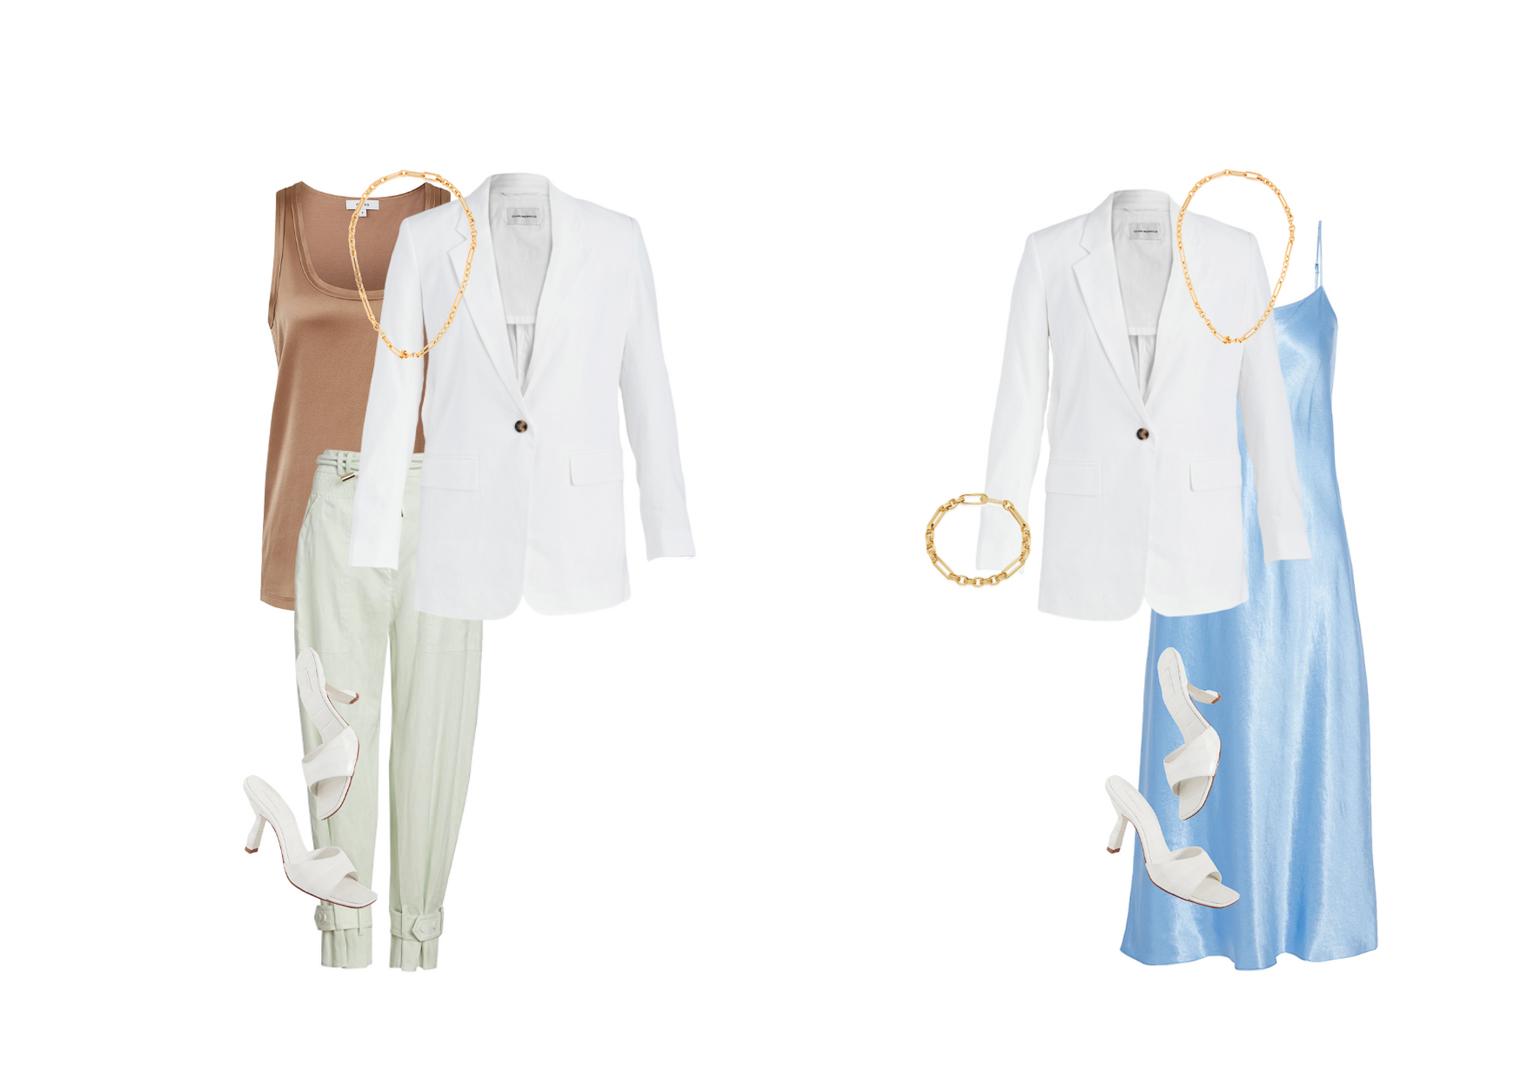 Stylish summer capsule wardrobe looks for the city